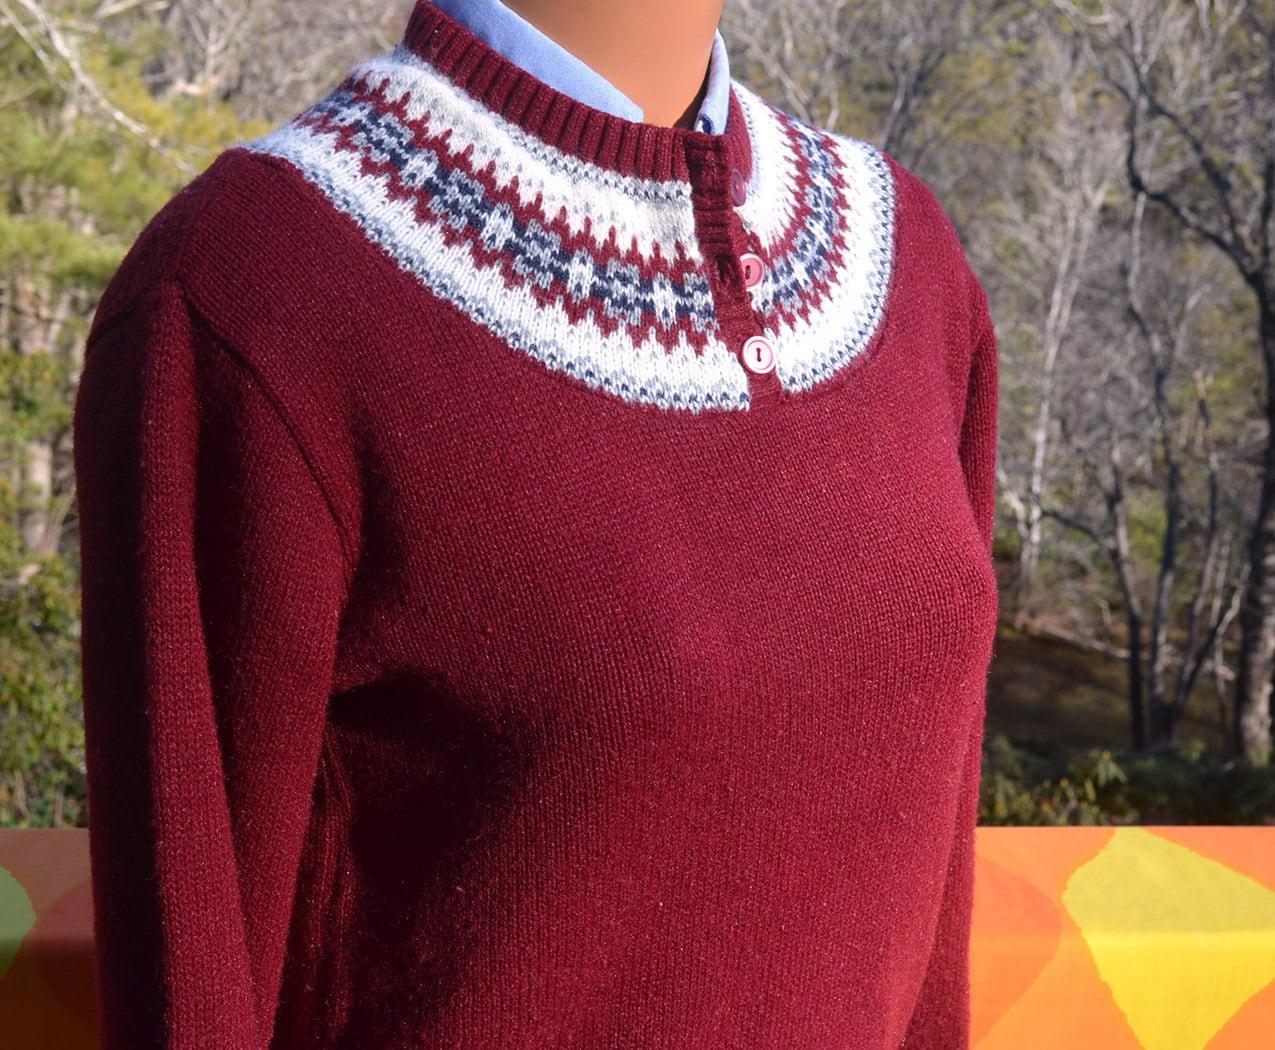 Vintage Fair Isle Sweater - Gray Cardigan Sweater